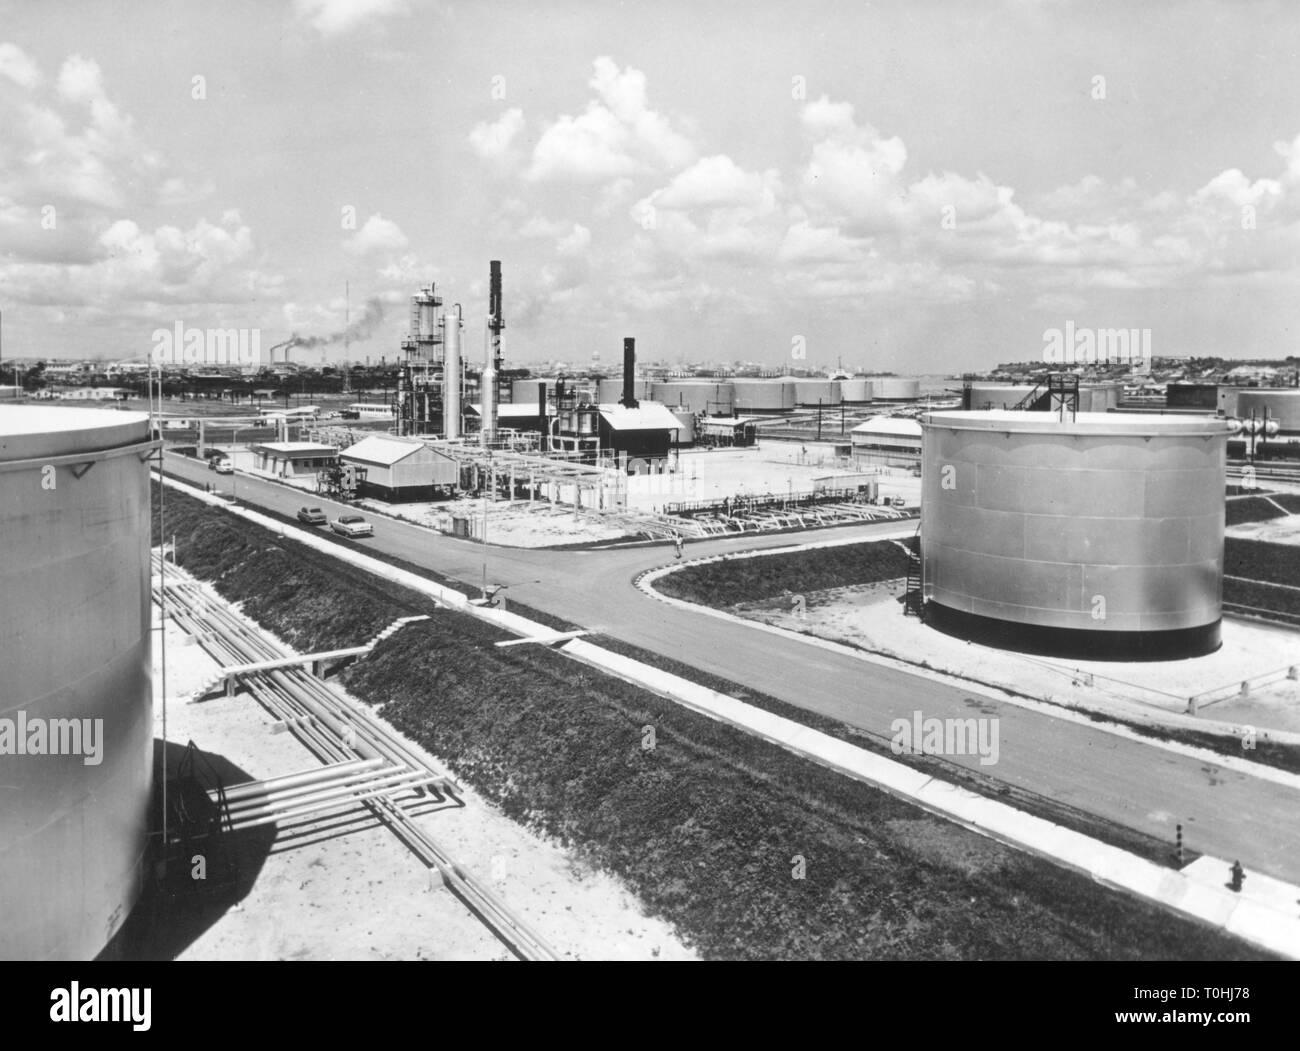 Geographie/Reisen, Kuba, Industrie, Erdöl, Shell Ölraffinerie, 1960, Additional-Rights - Clearance-Info - Not-Available Stockbild